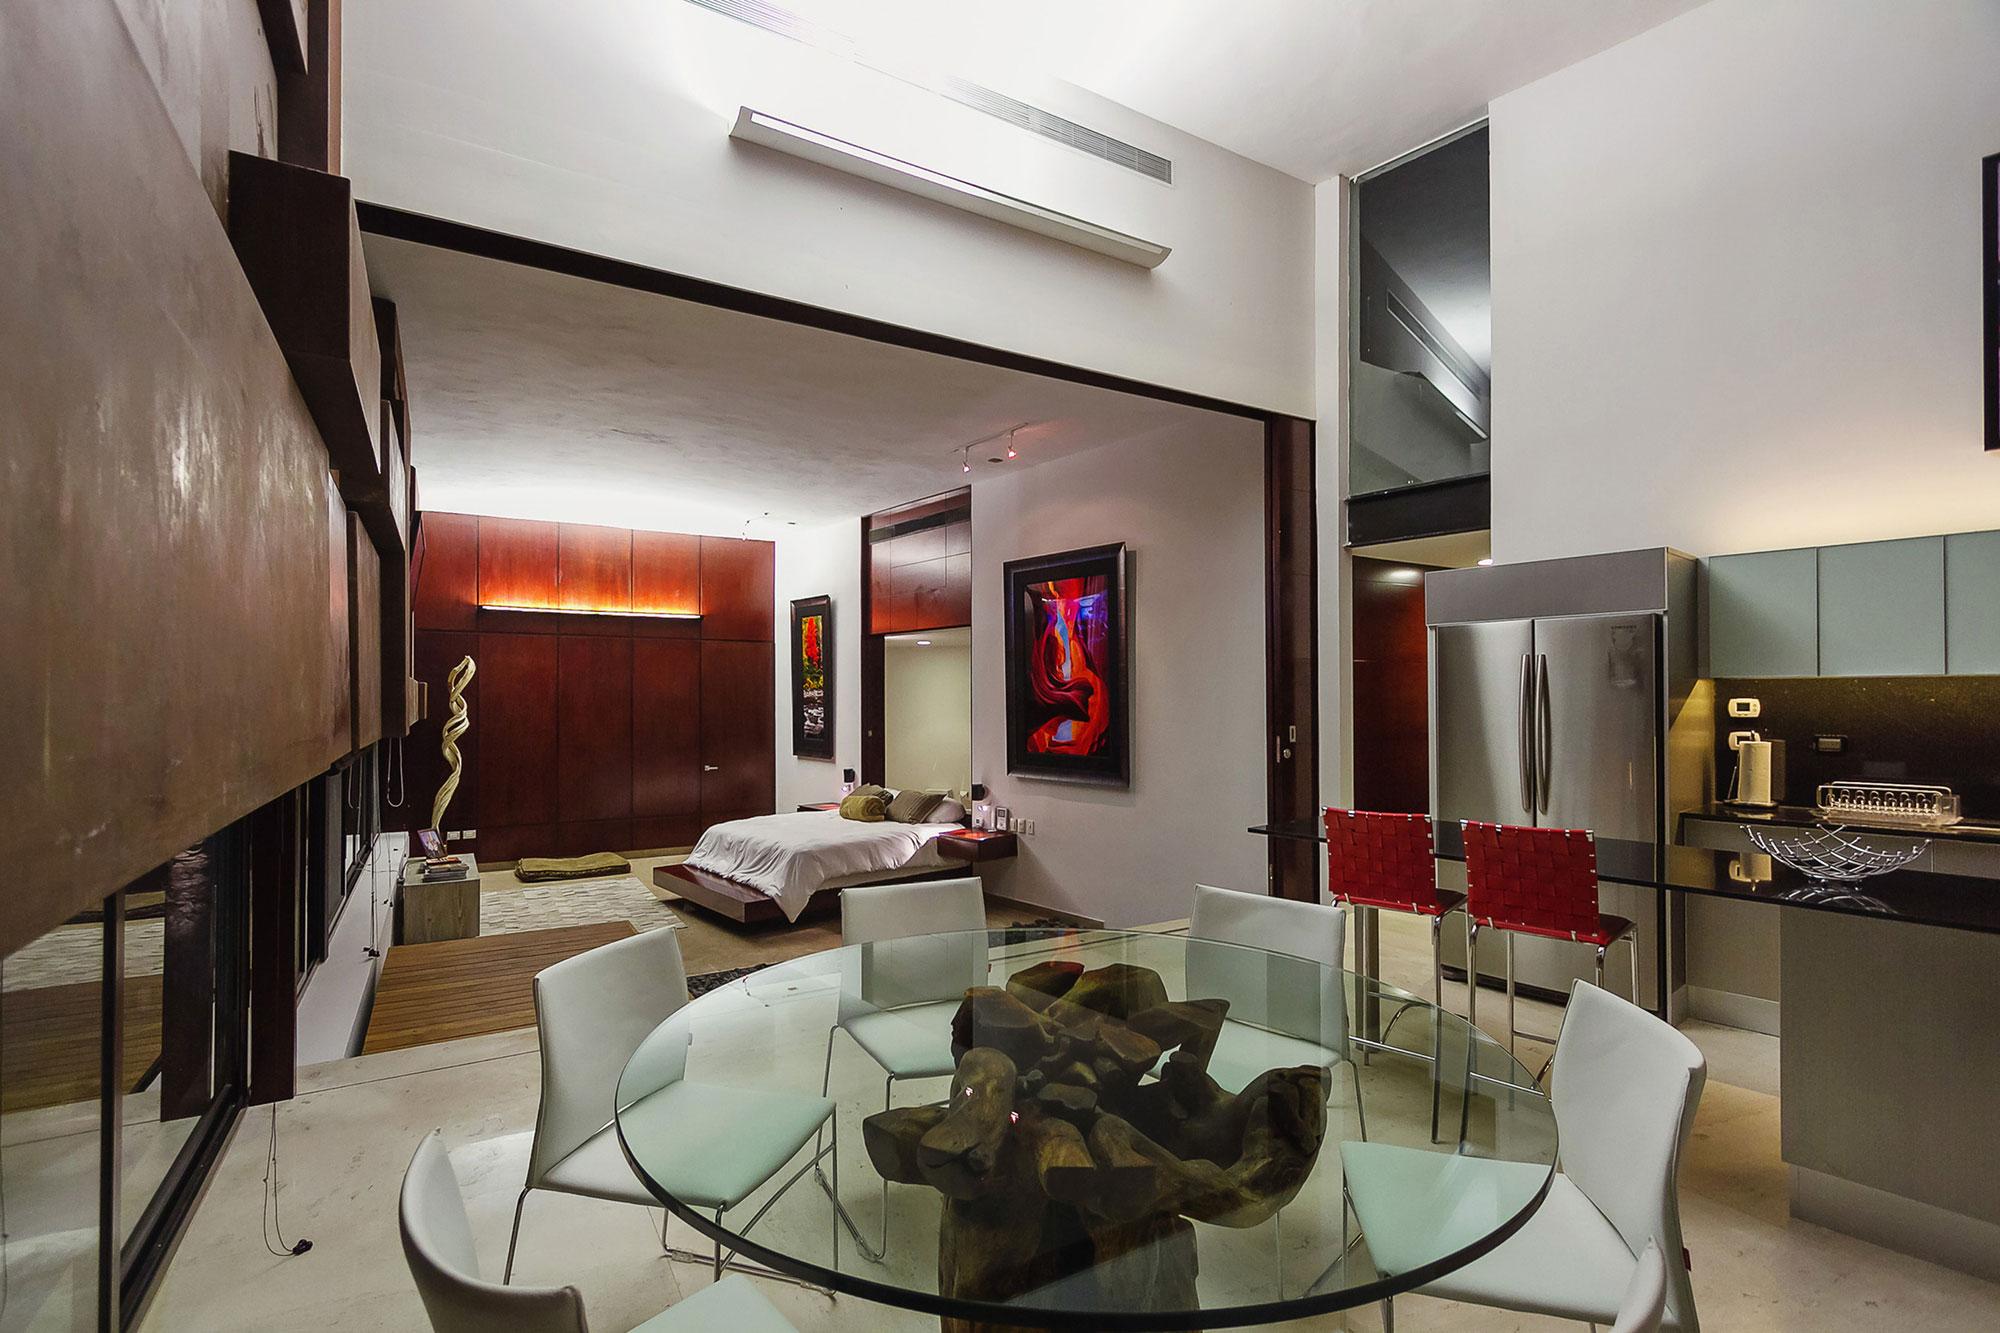 Dining Table, Kitchen, Bedroom, Lighting, Contemporary Residence in Merida, Yucatan